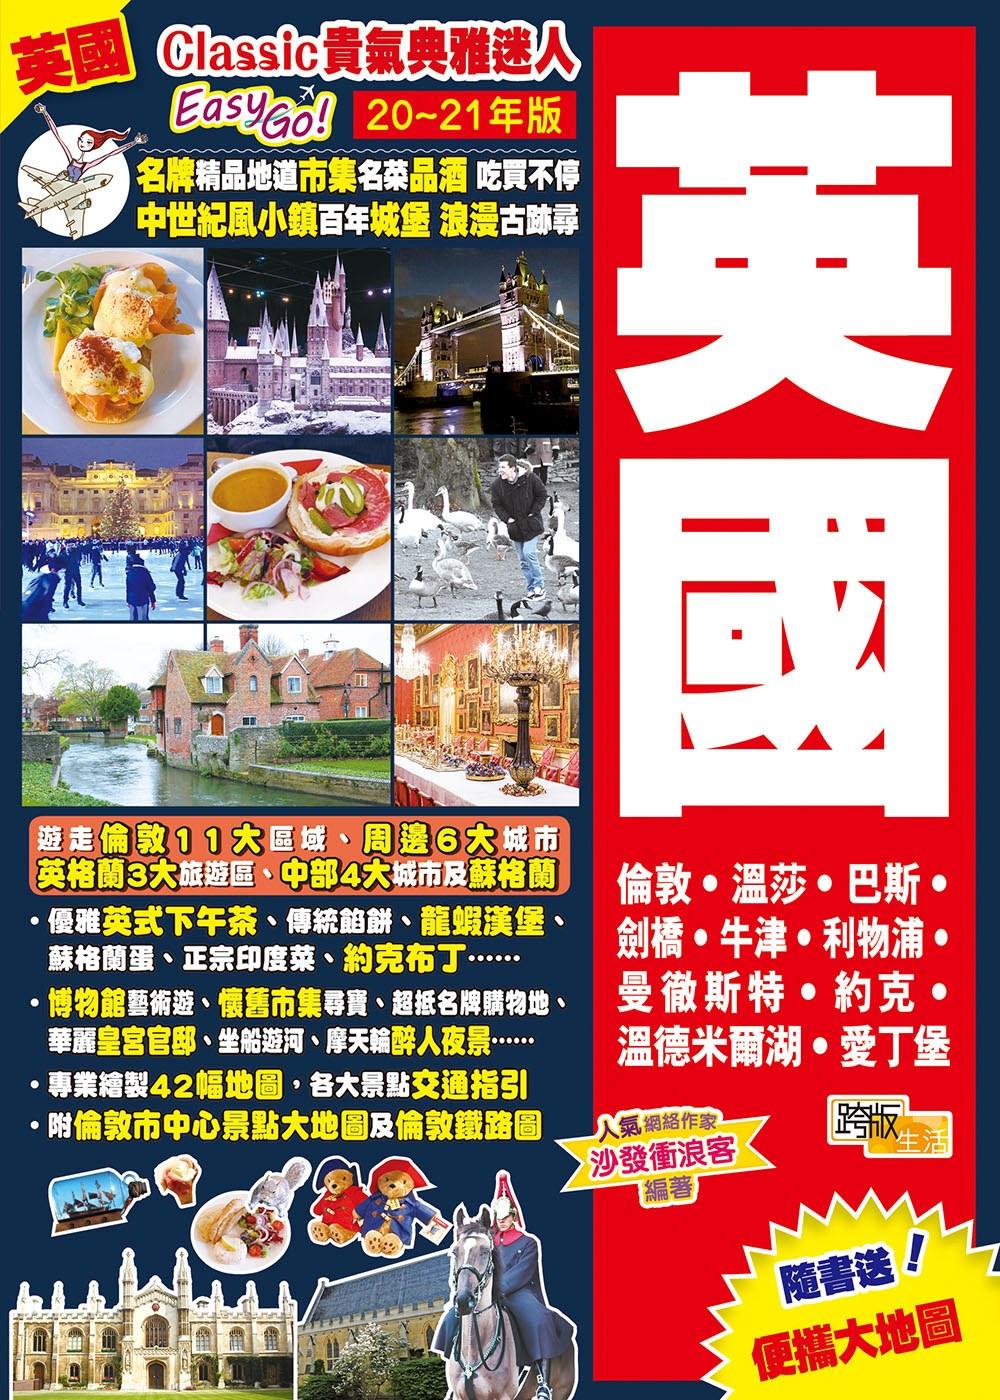 英國(20-21年版):Classic貴氣典雅迷人Easy GO!